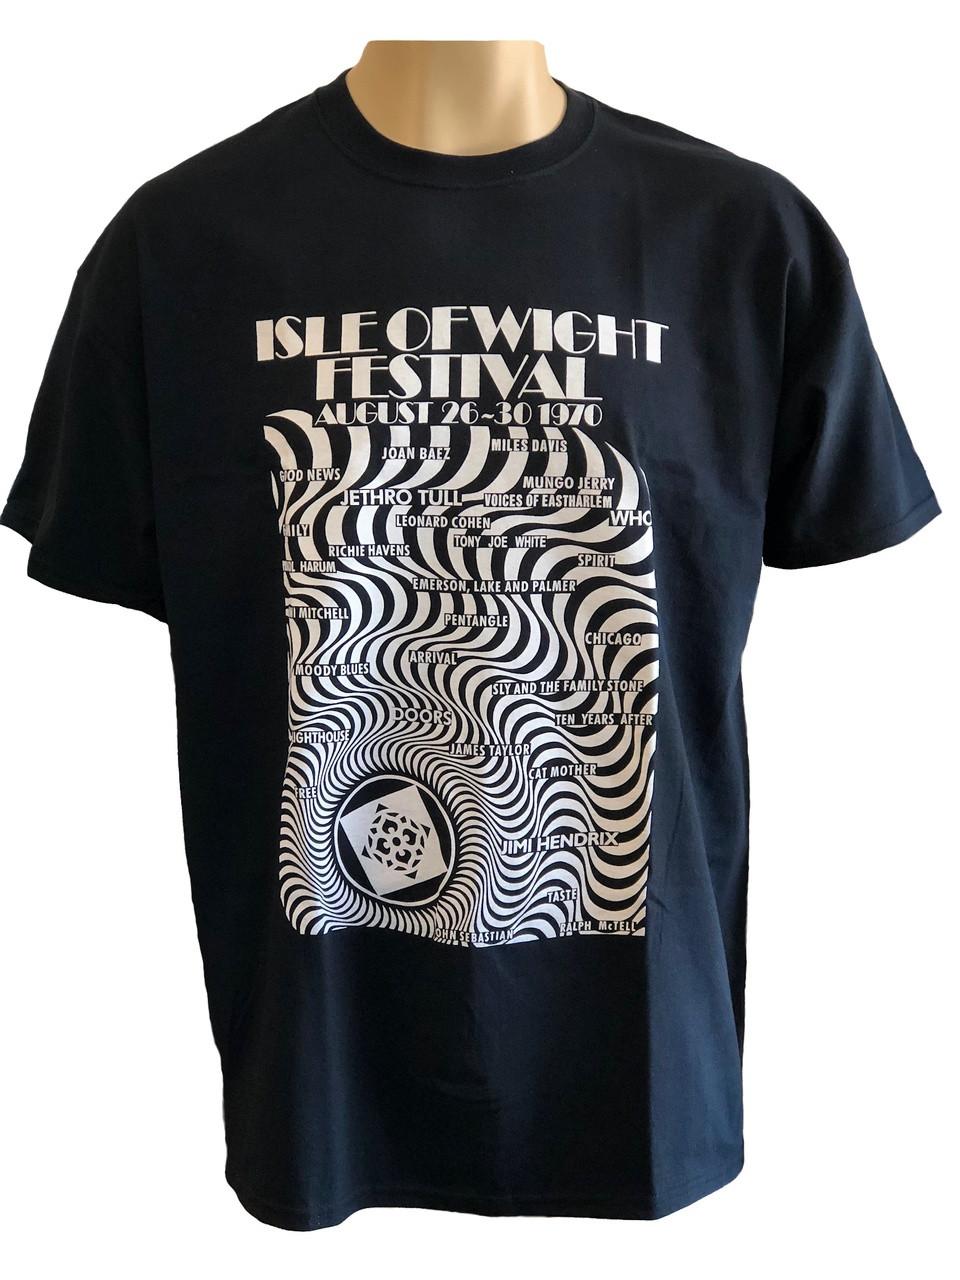 IW Festival 1970 T Shirt